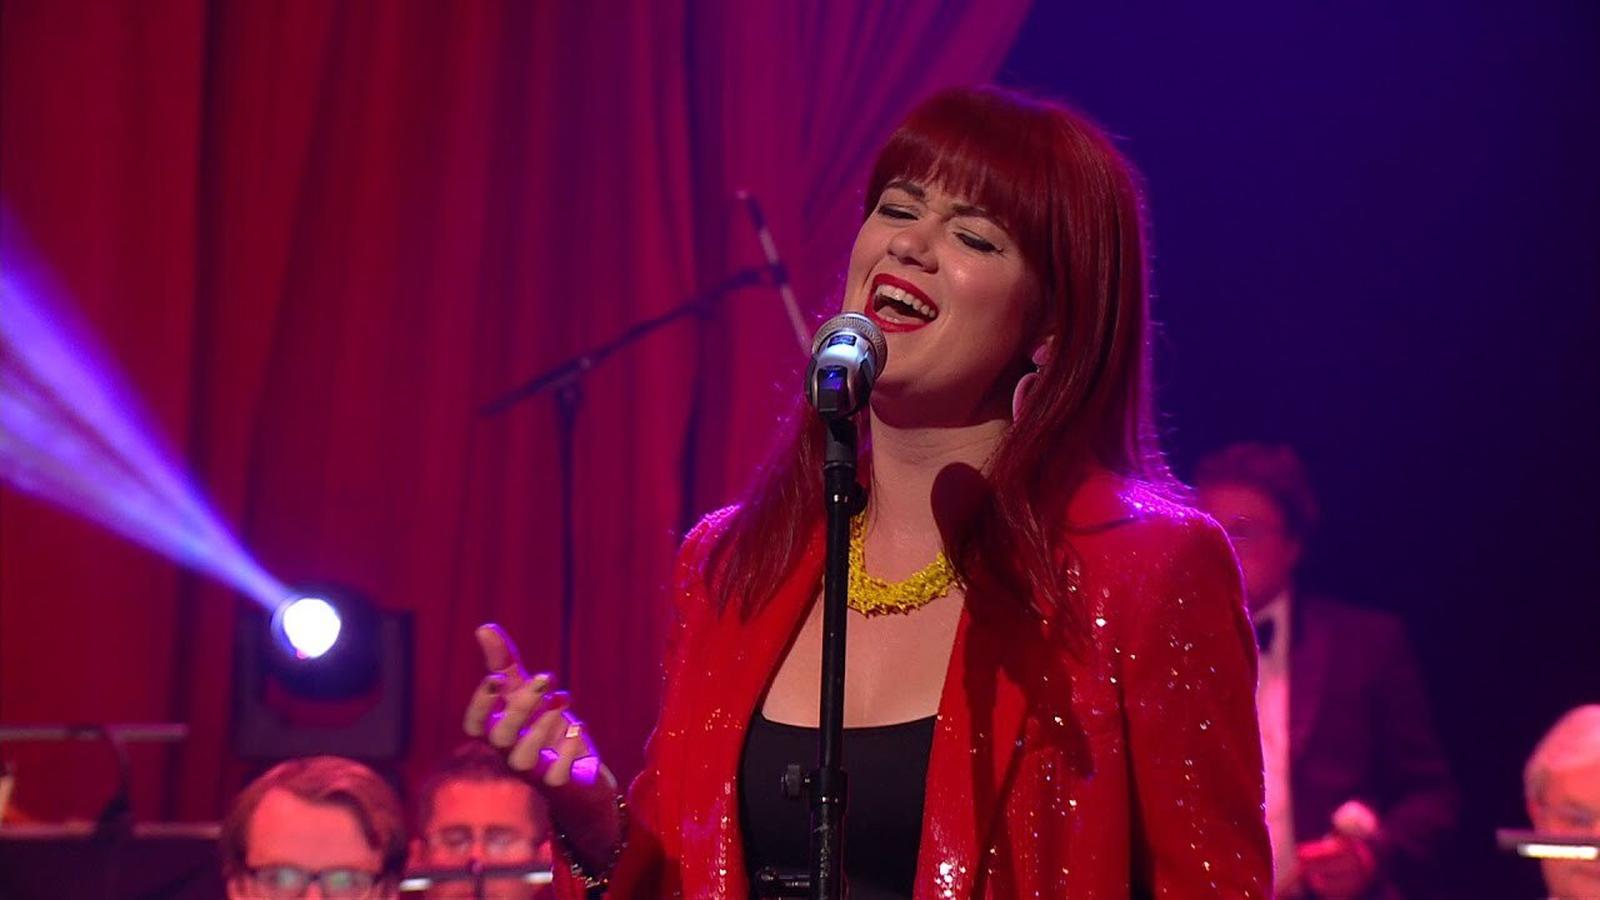 Watch: Suzanne Savage & the RTÉ CO celebrate Leonard Cohen